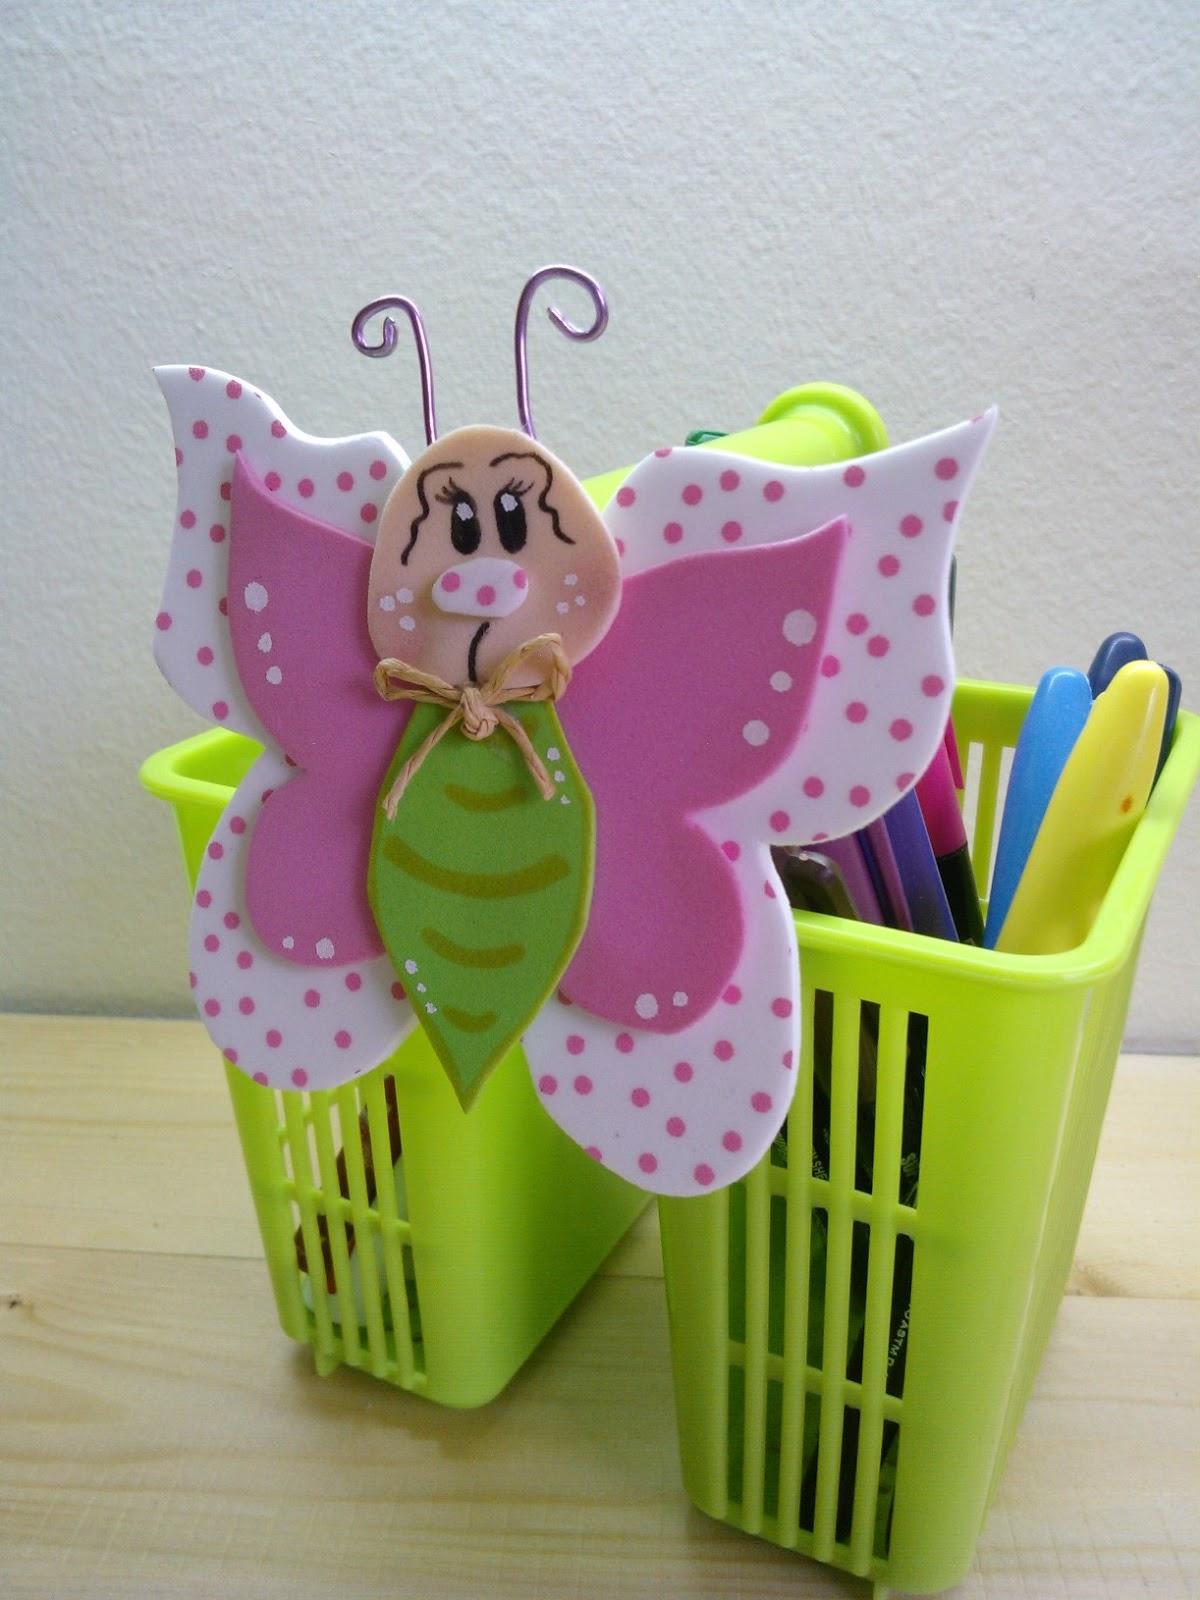 Cucadas de mami decoraci n mariposa - Decorar paredes infantiles con goma eva ...